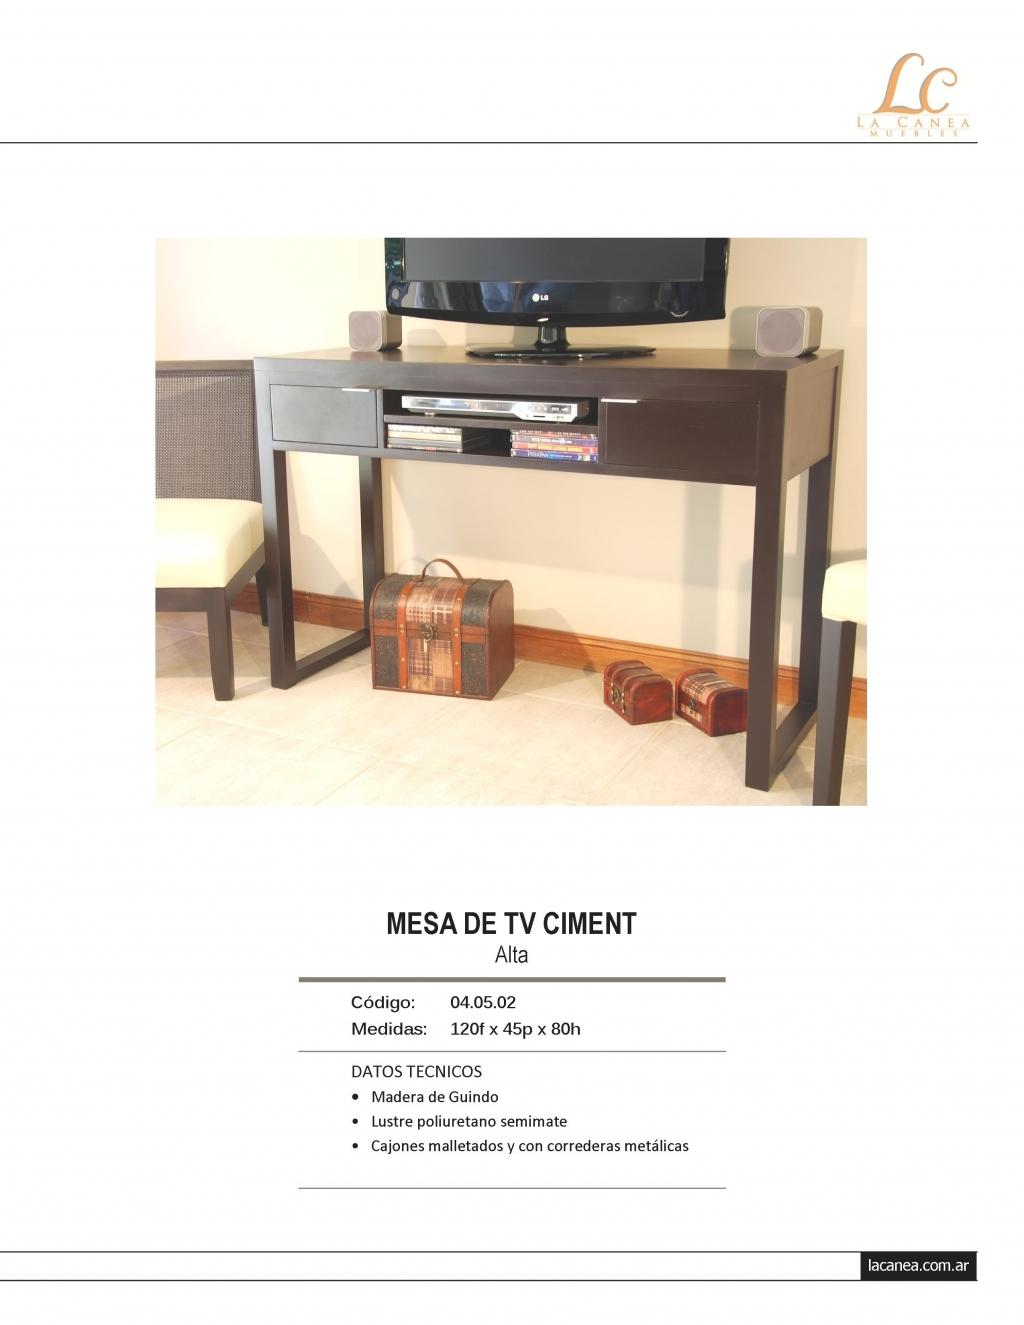 Mesa de tv ciment plasma alta mesas de tv portal de for Mesas televisor plasma